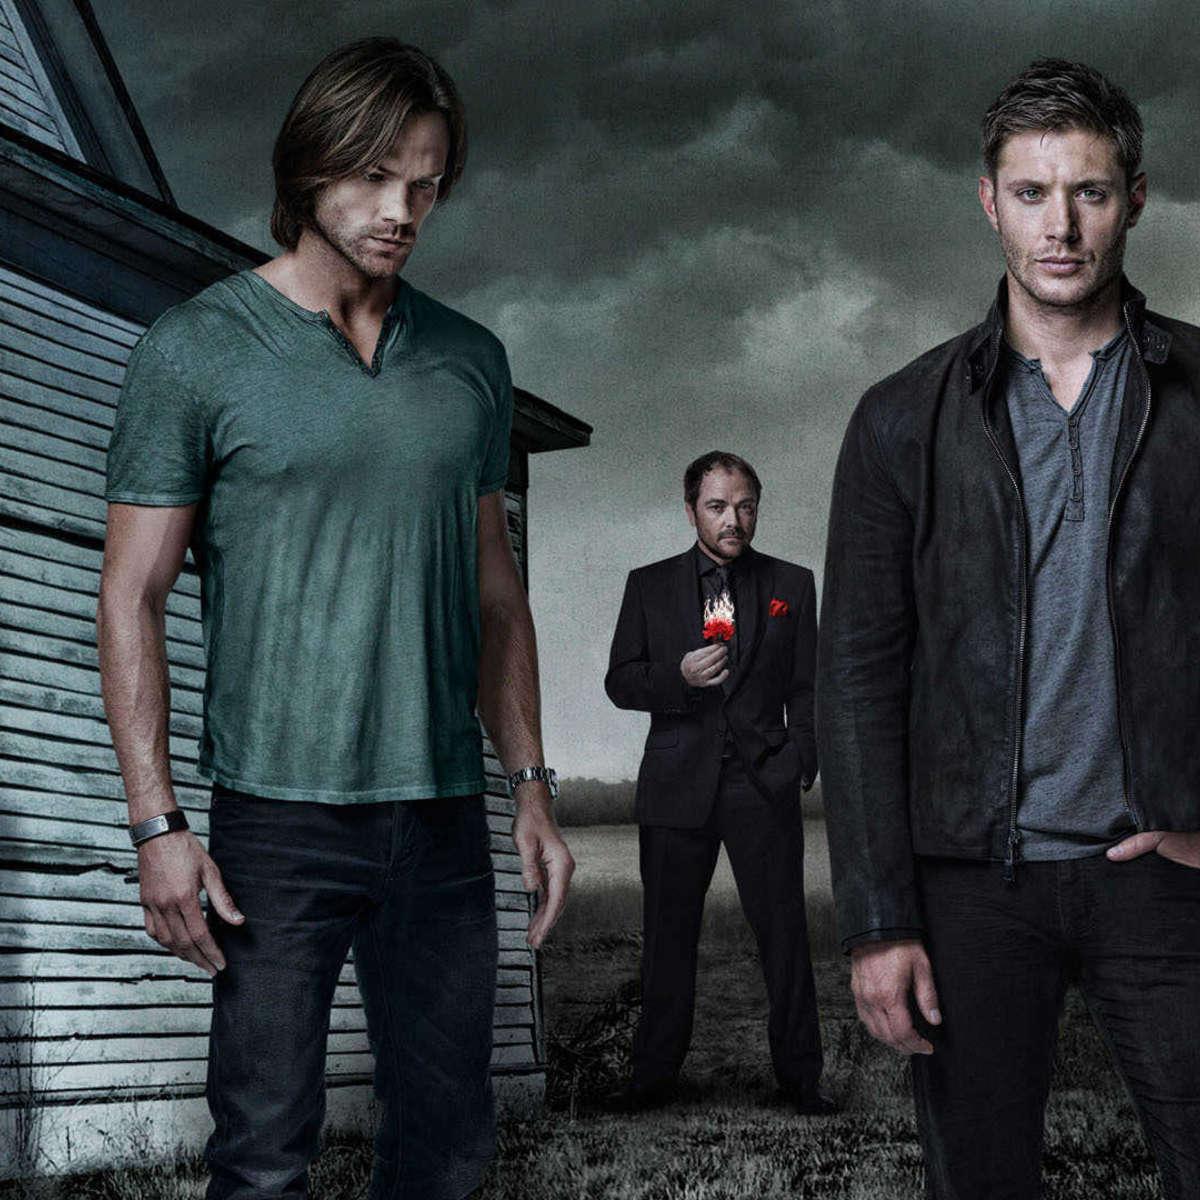 supernatural-season-10-tv-series-wallpapers-hd-hdwallwide-com.jpg